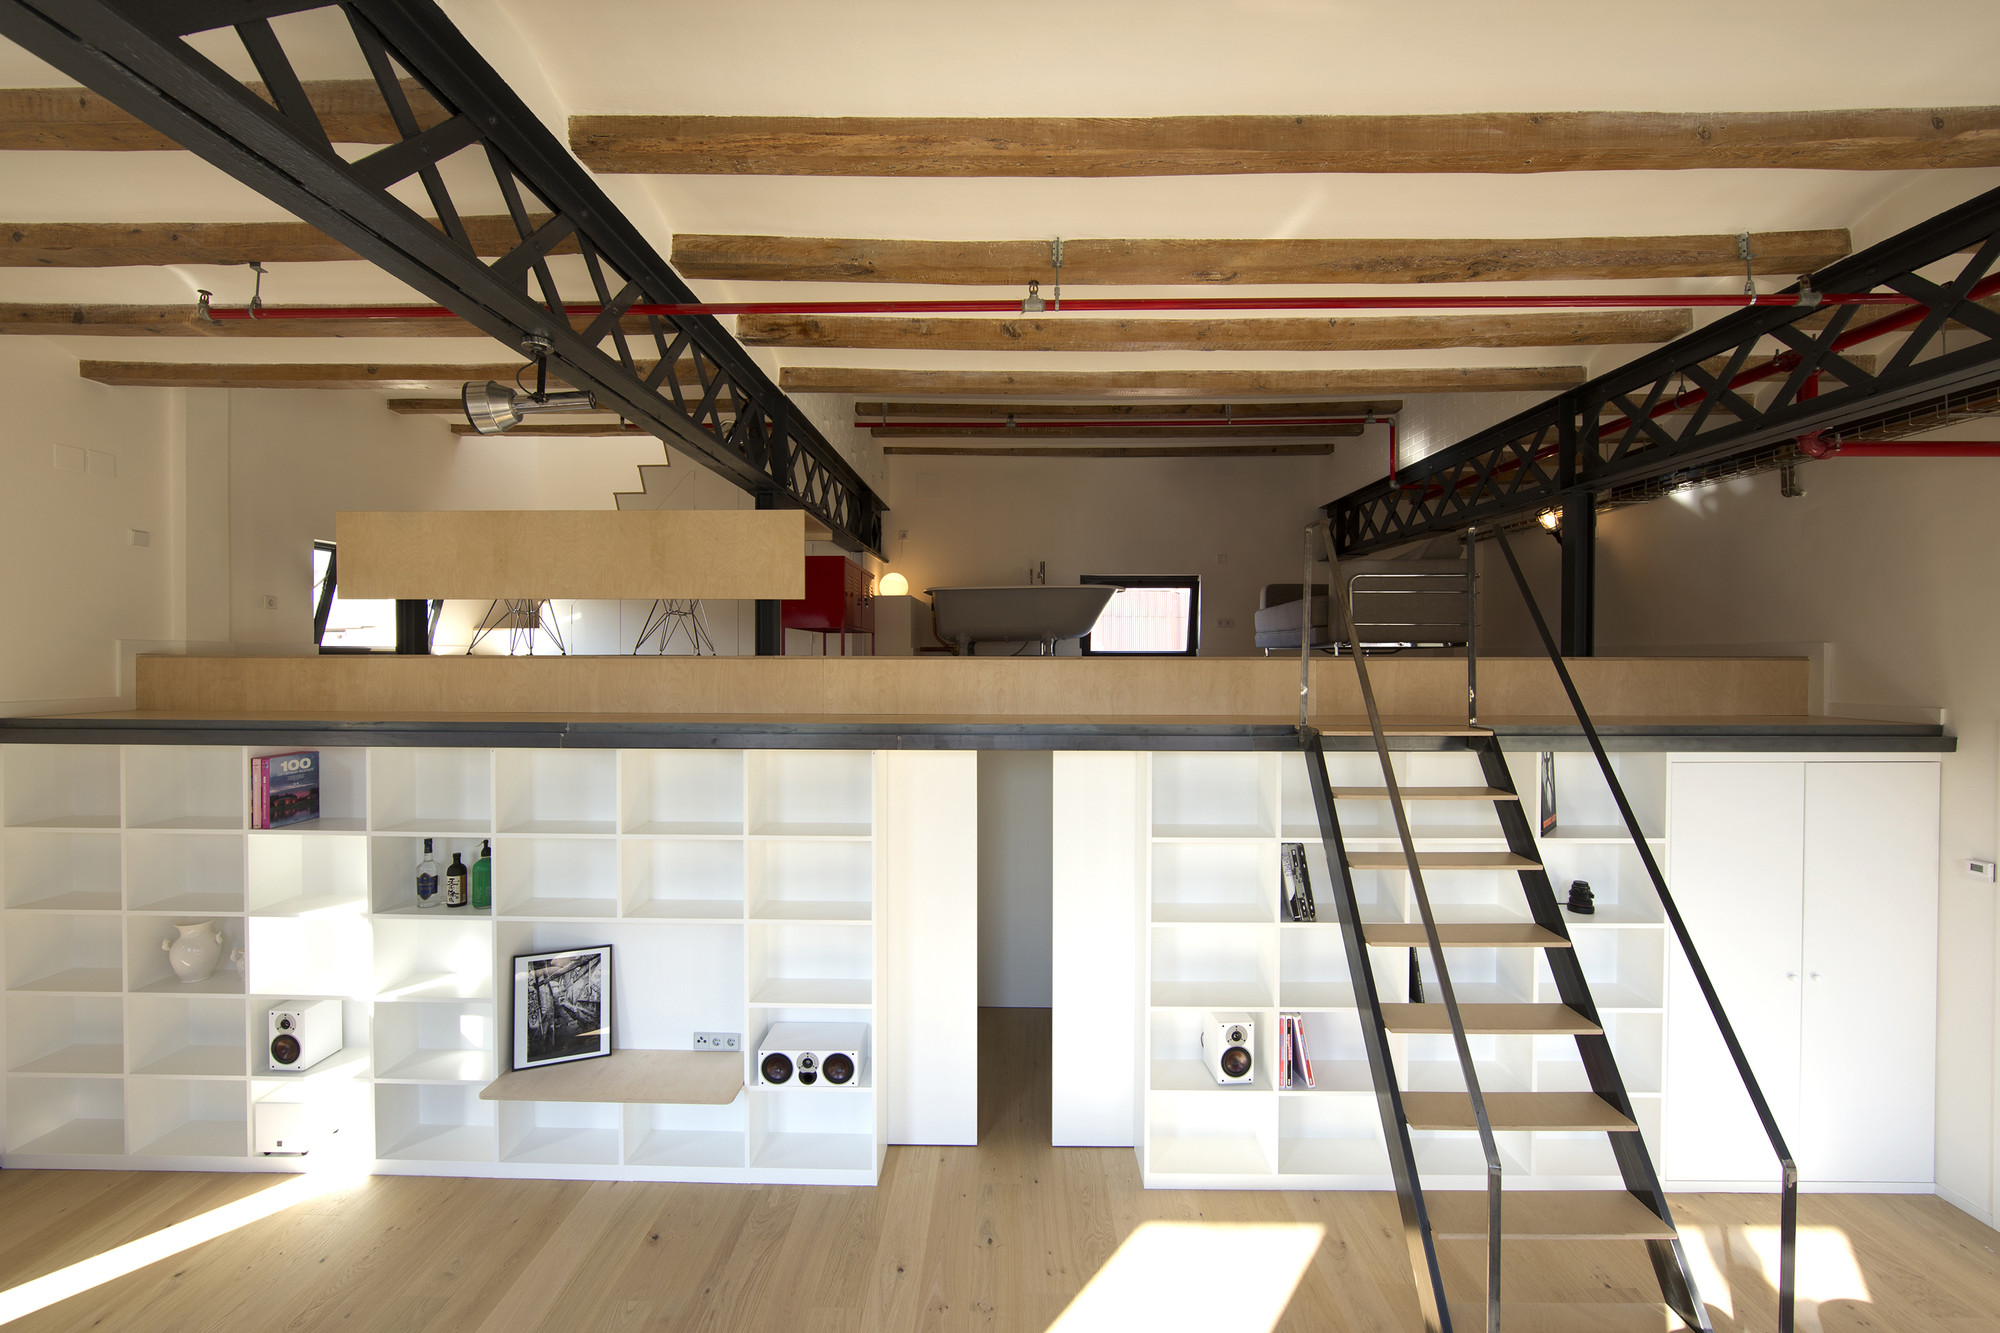 Gallery of Industrial Loft Grober / Meta-studio - 9